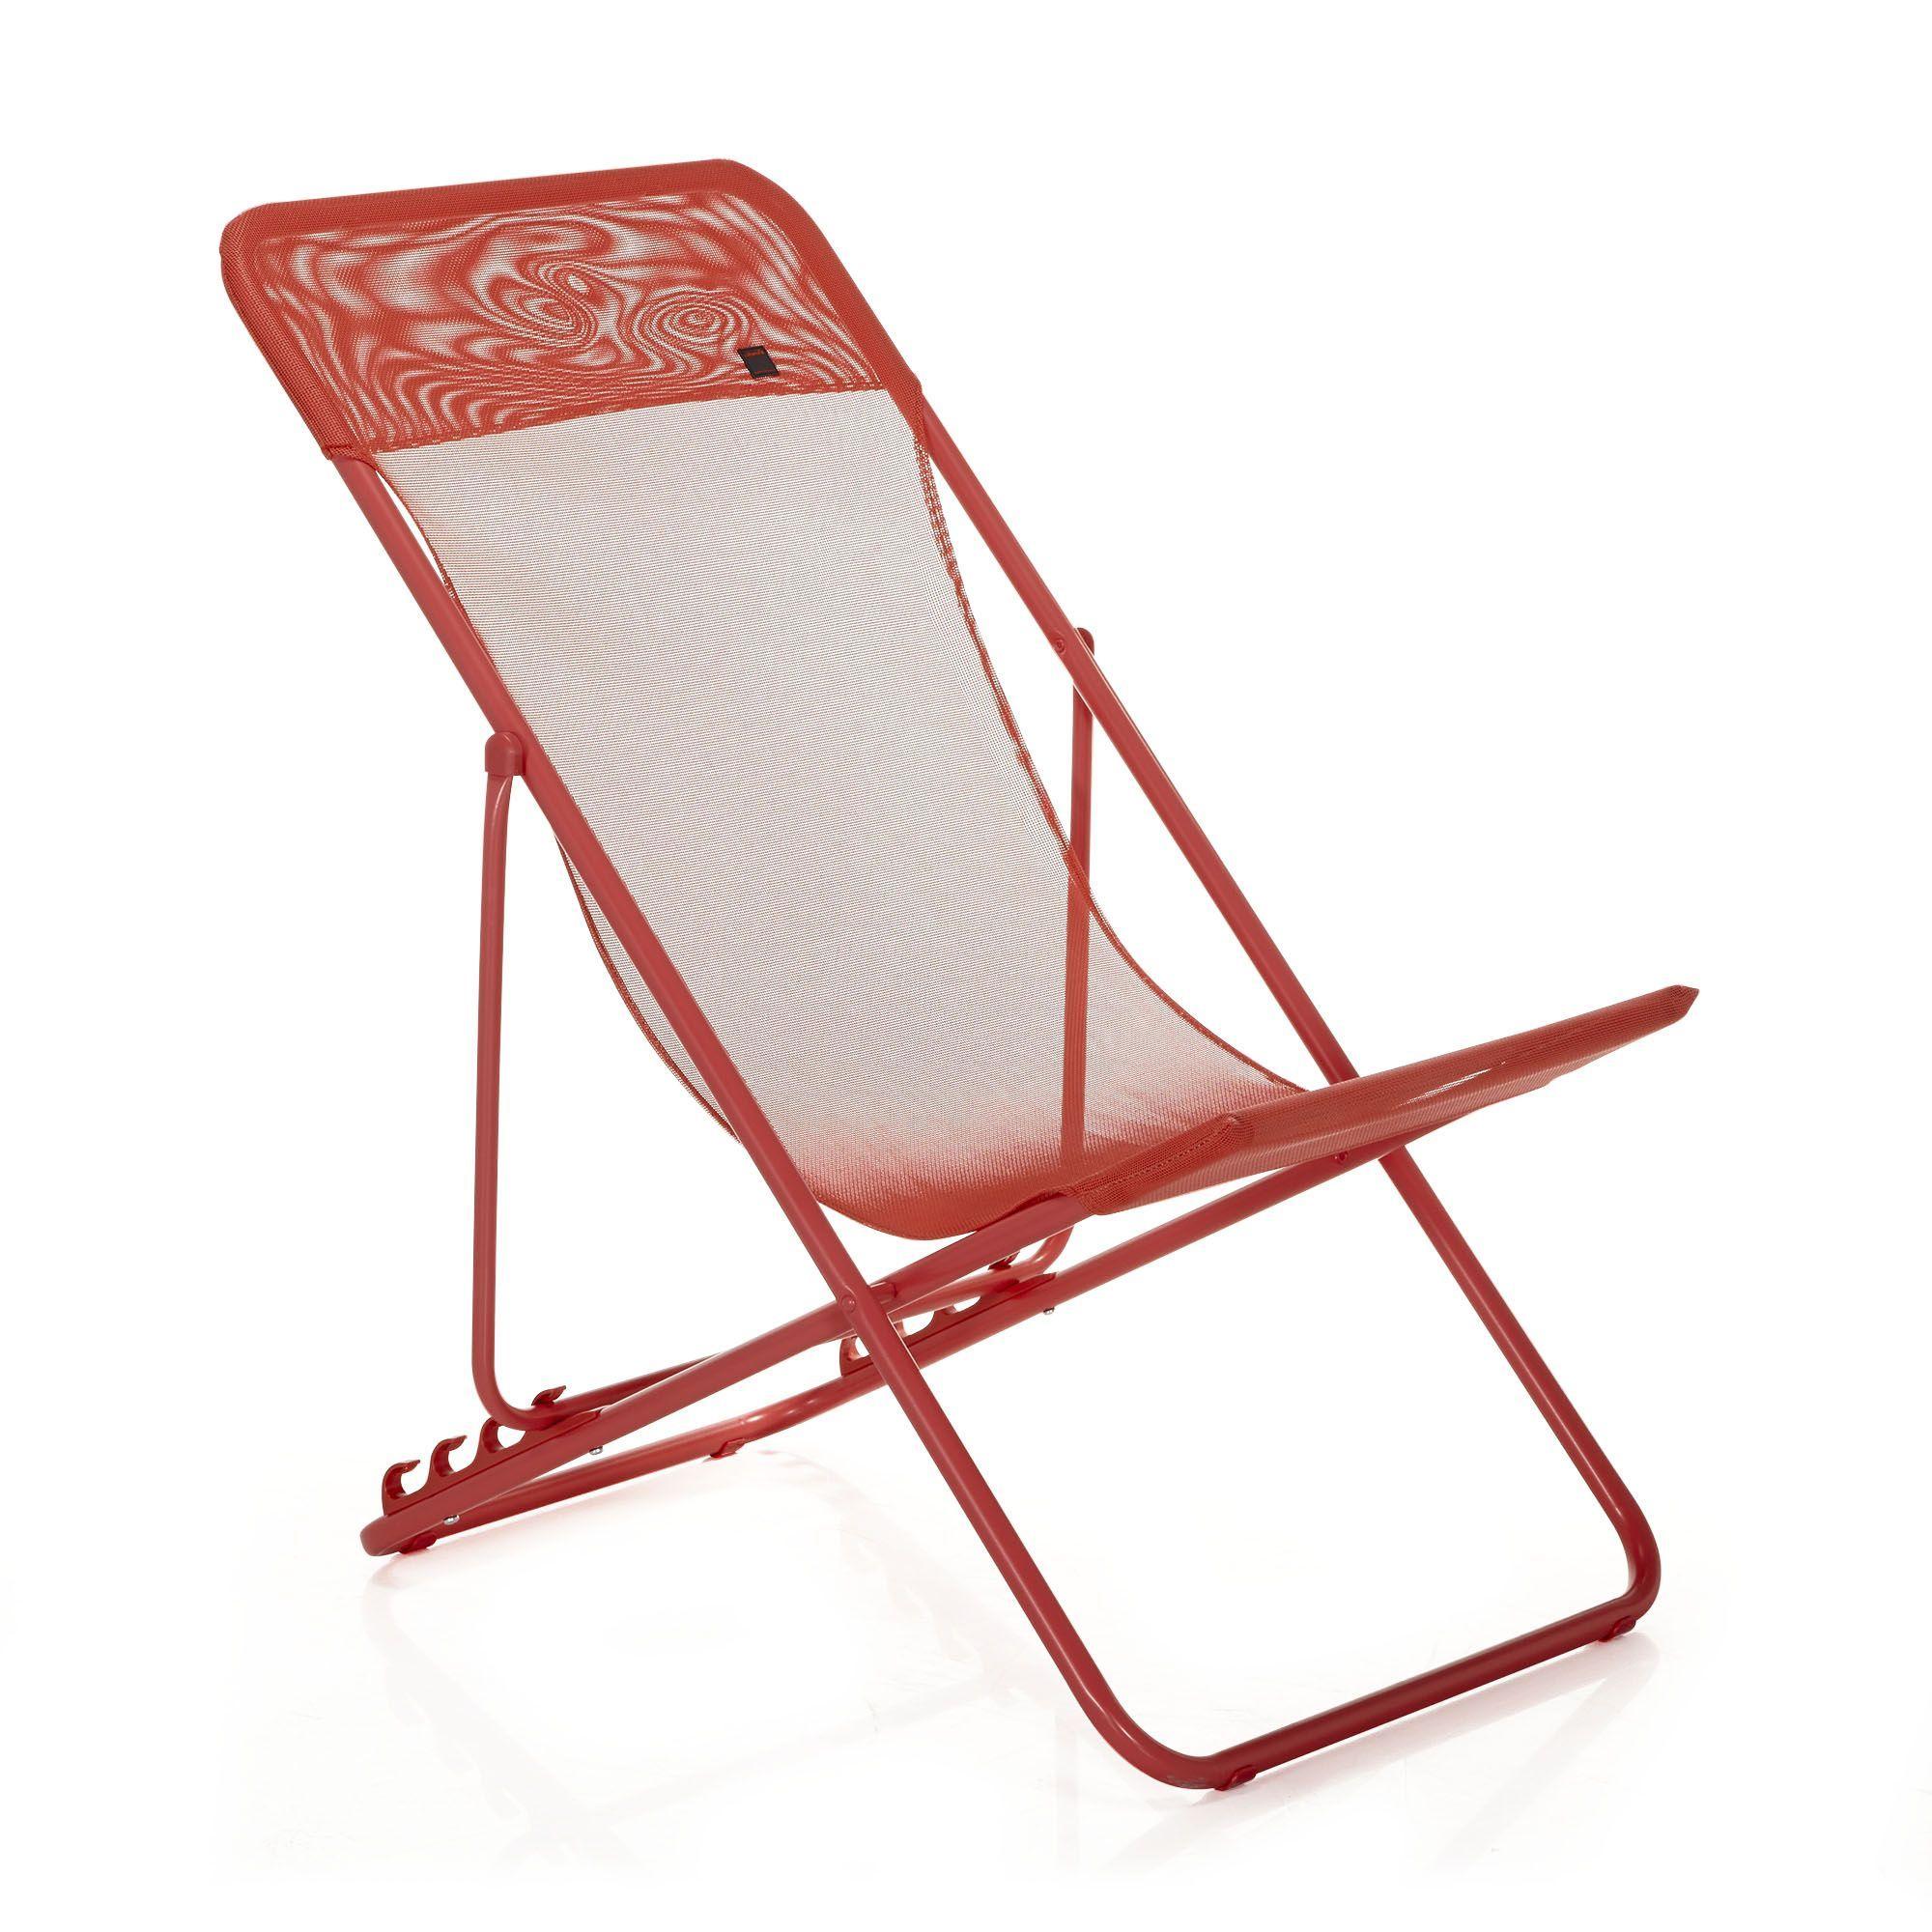 Chaise Longue Pliante Rouge Lafuma - Maxi - Chaises Longues ... tout Chaise Longue De Jardin Lafuma